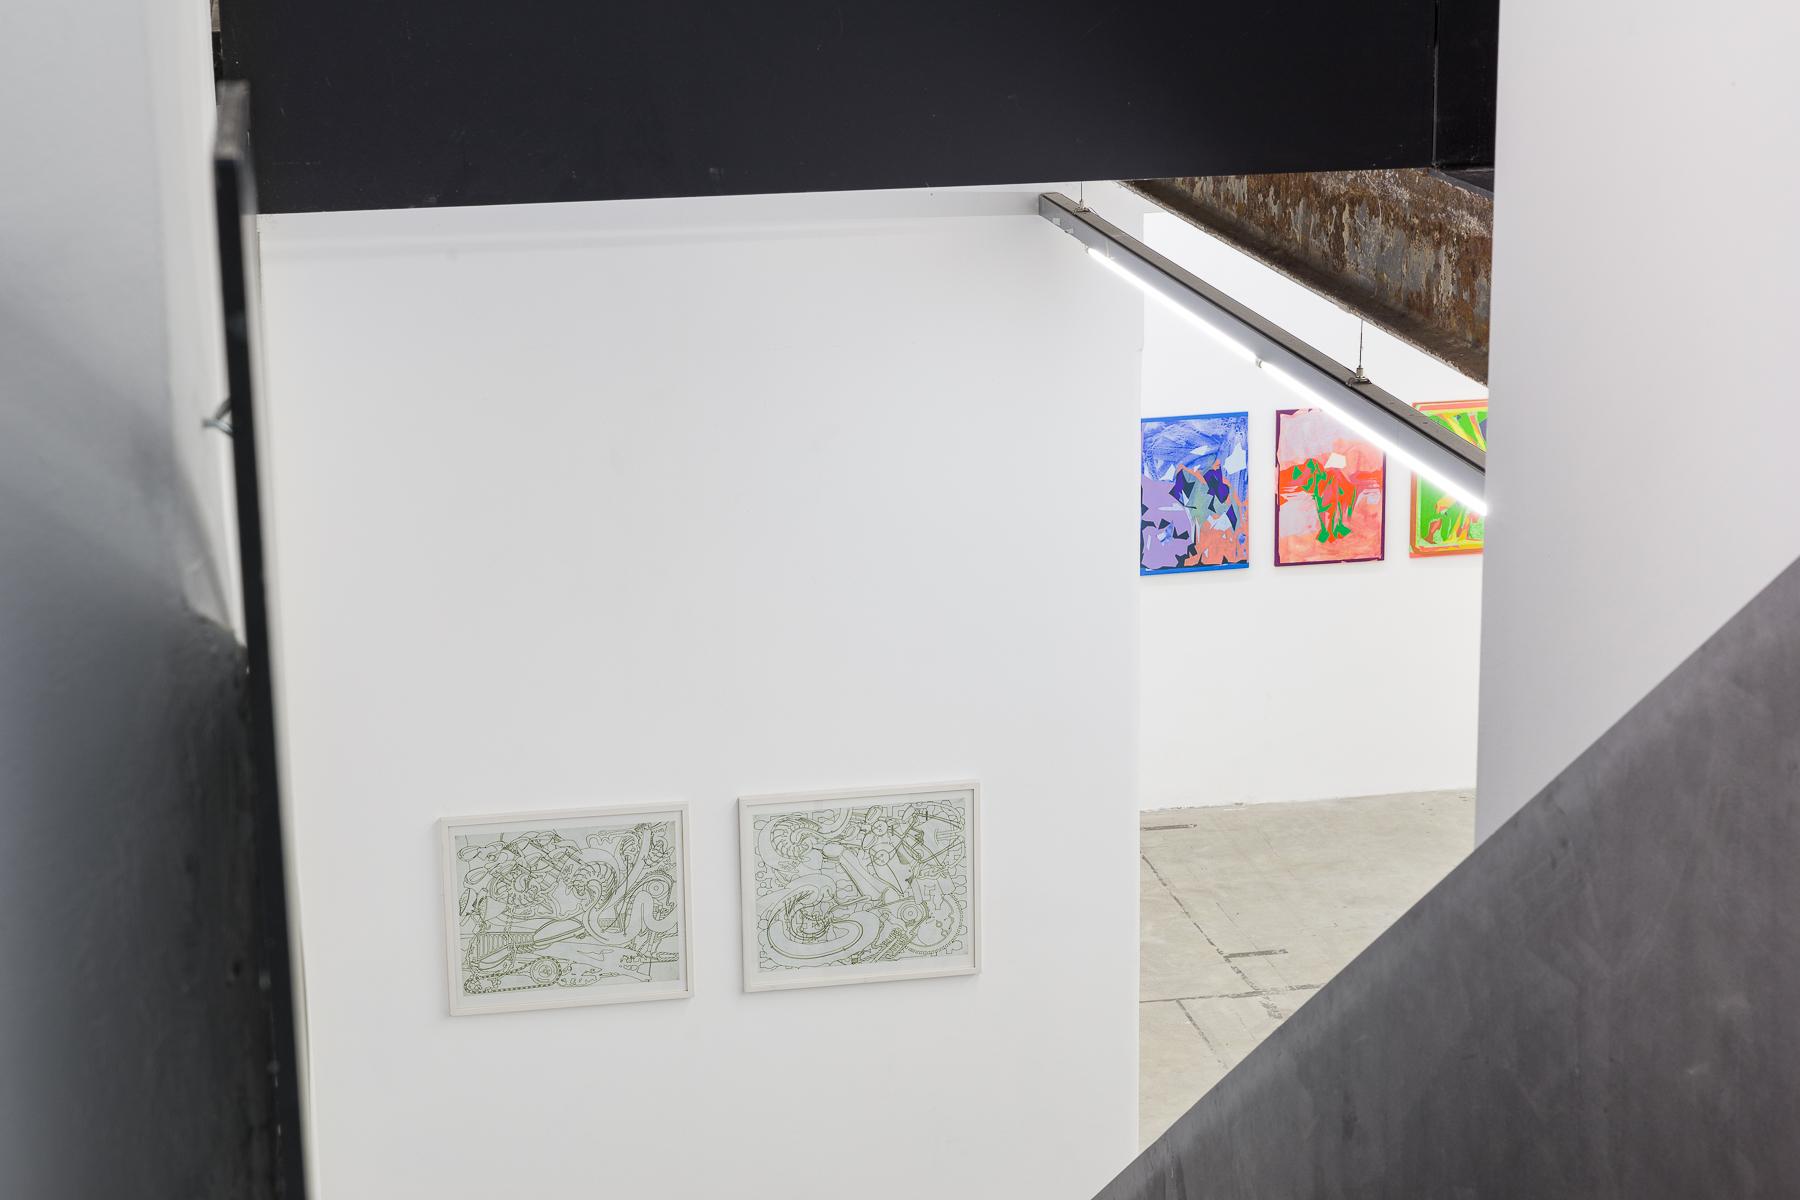 2019_04_Ausstellungsansichten_Francis-Ruyter_hurricane-time-image_008_web.jpg